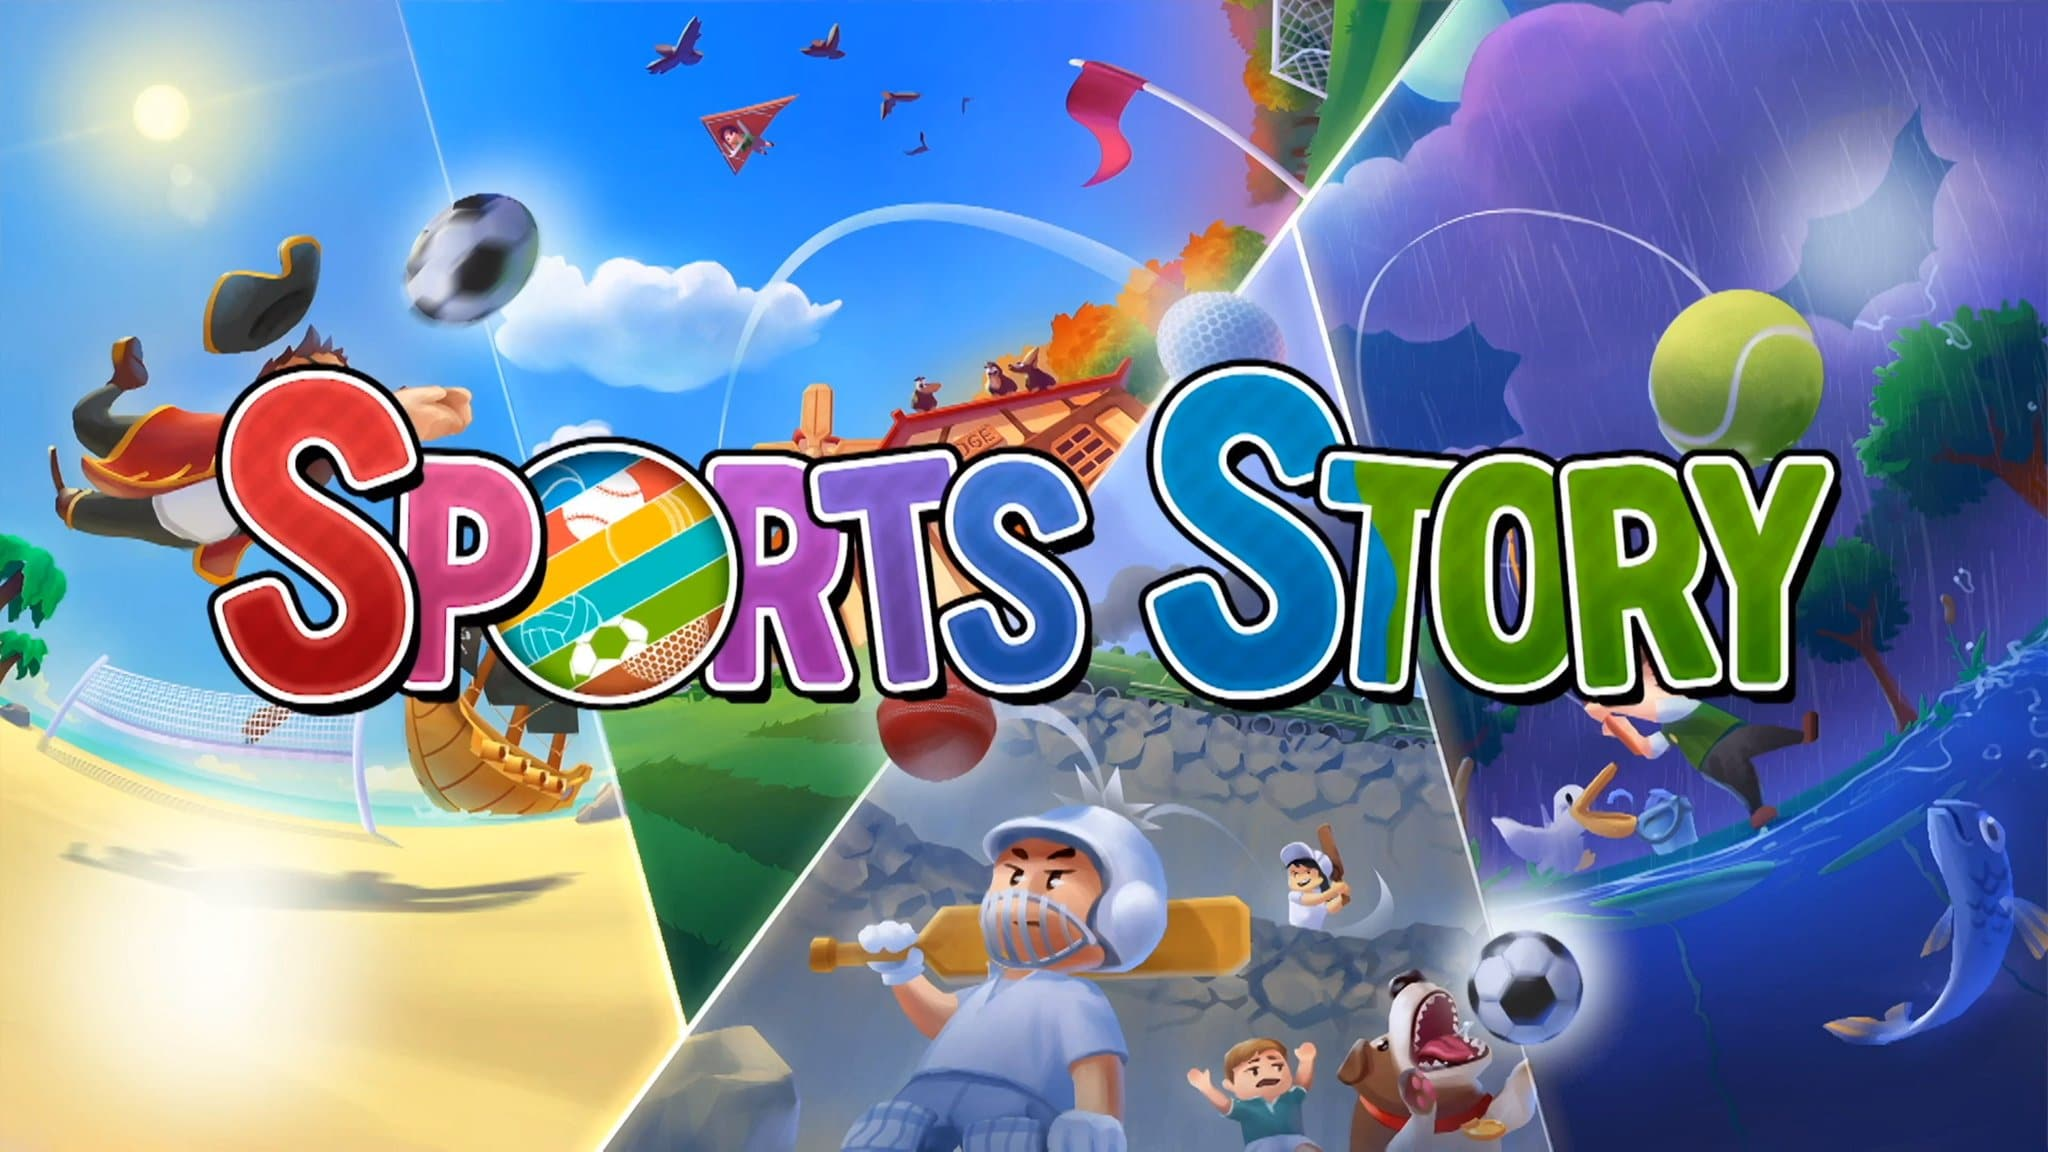 Sidebar Games comparte novedades sobre Sports Story, la esperada secuela de Golf Story